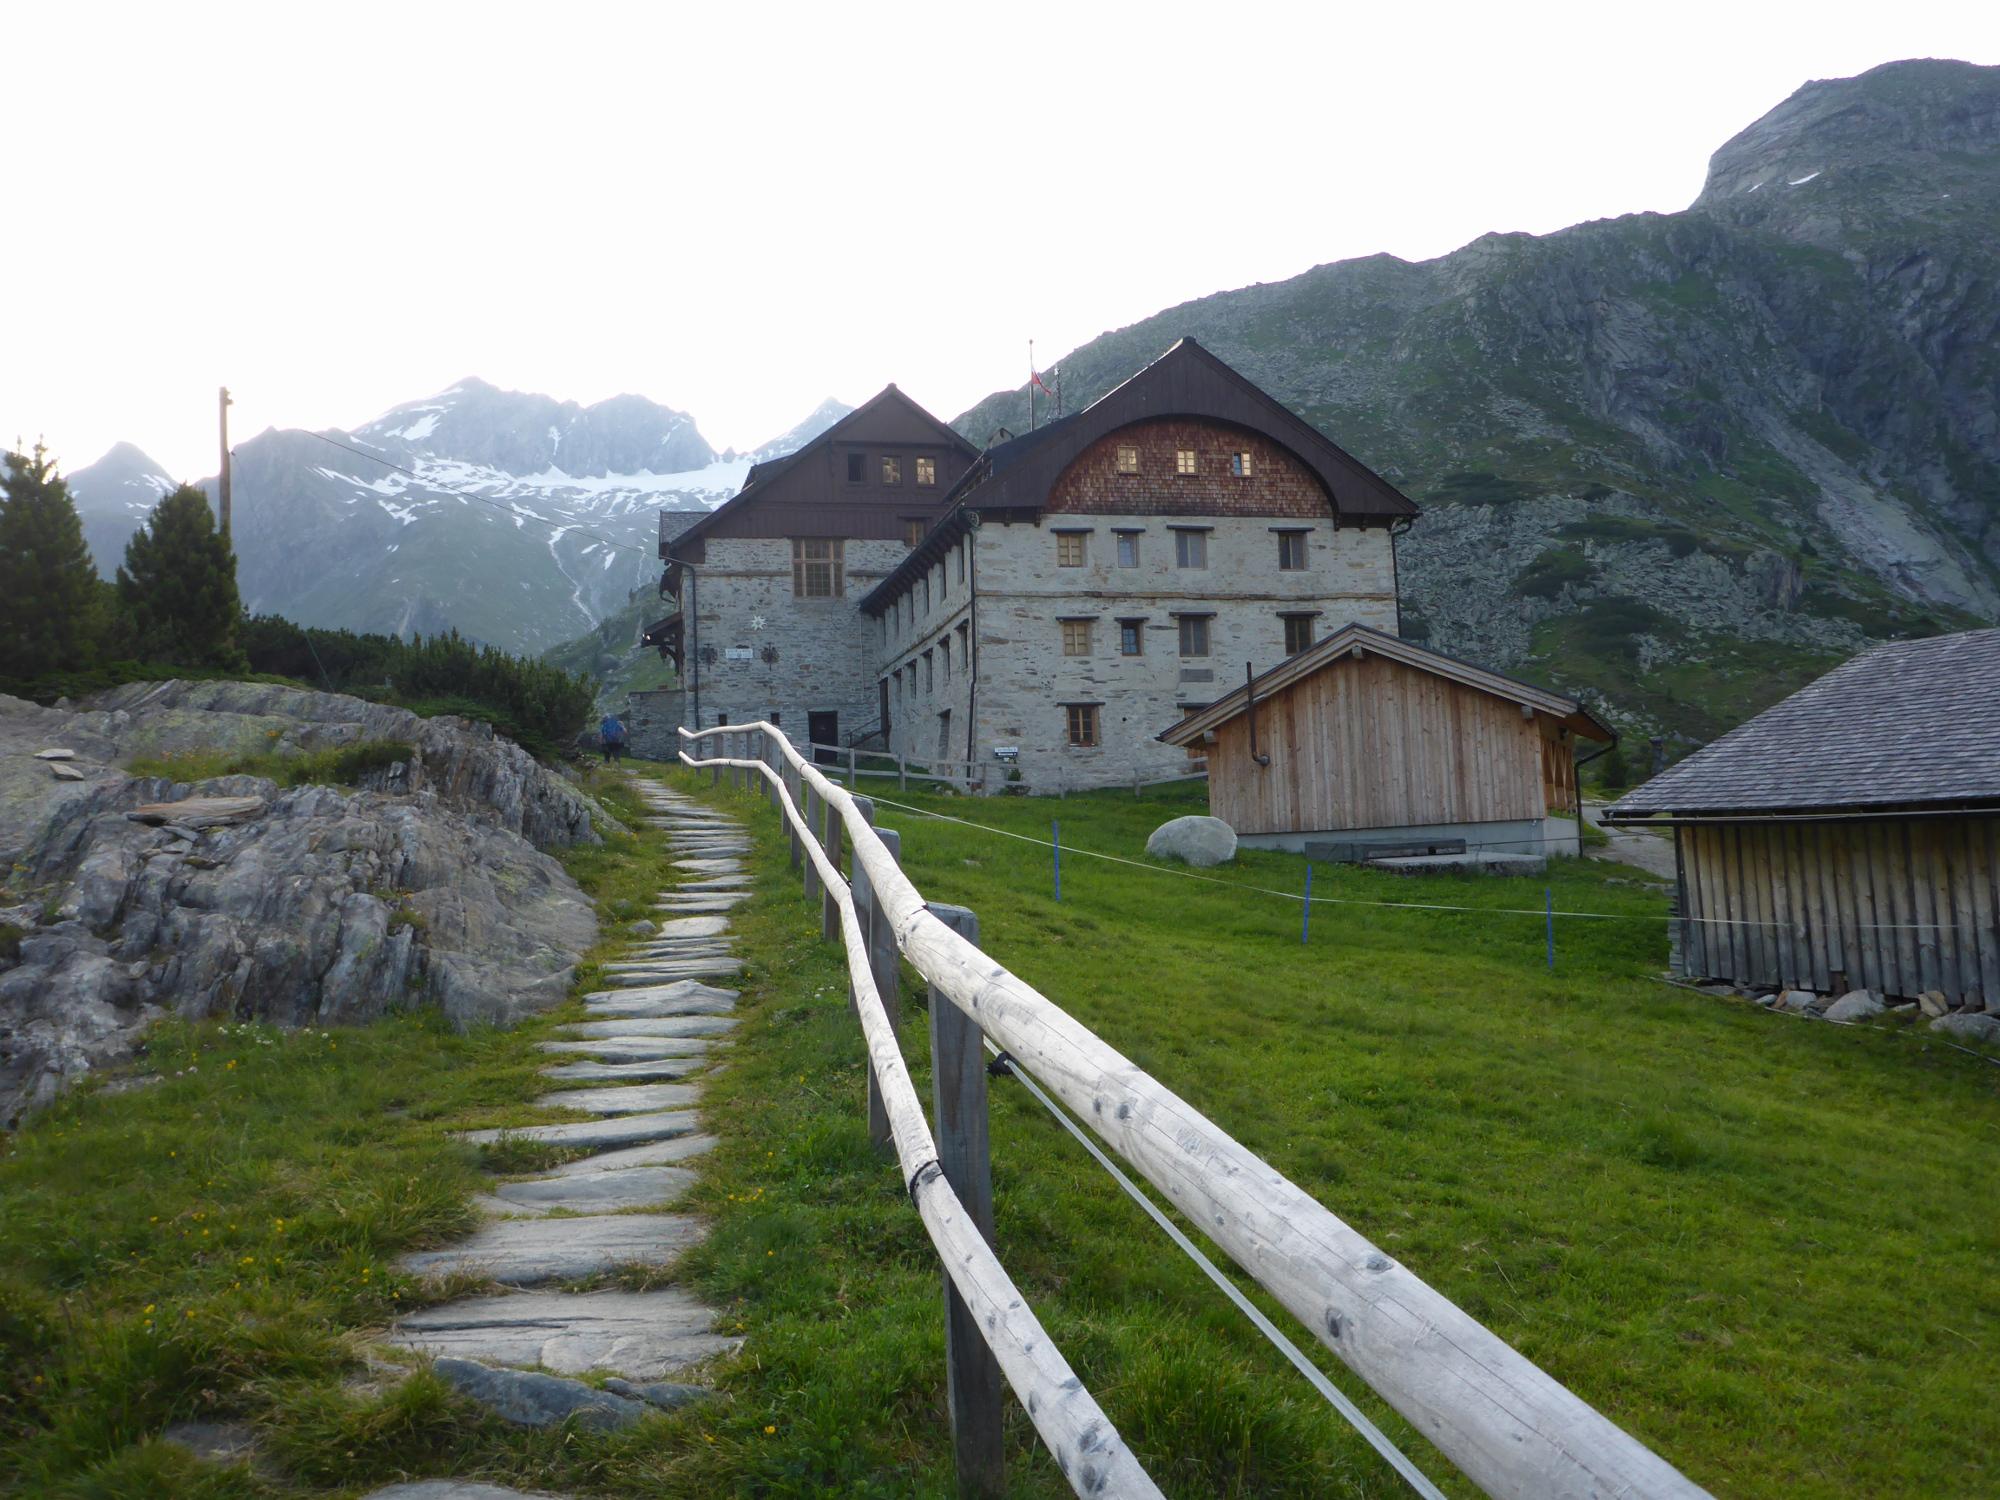 Berliner Hütte